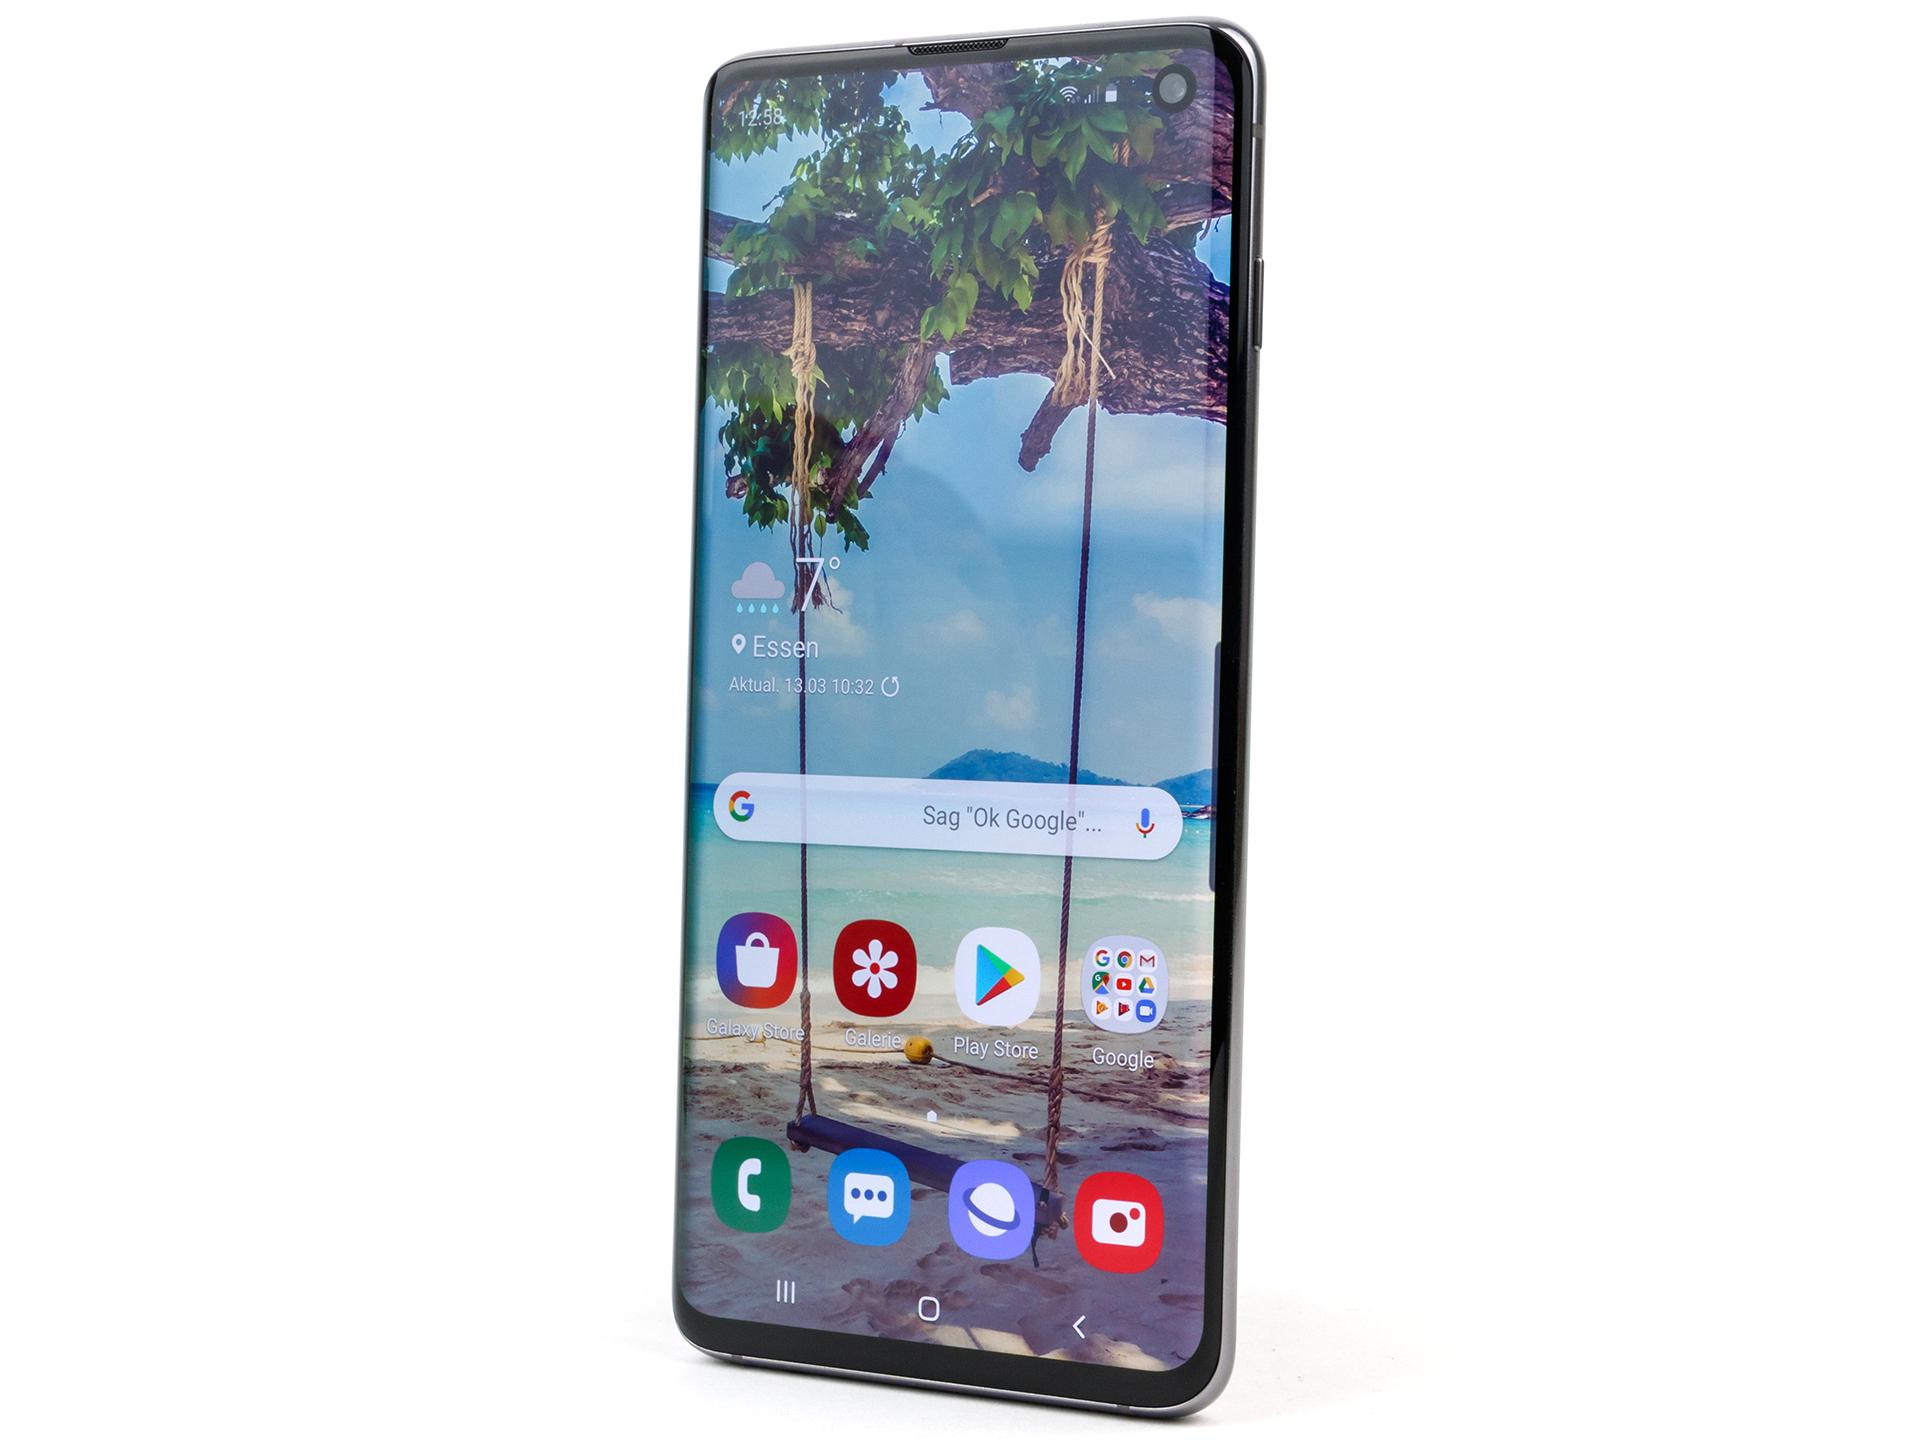 Samsung Galaxy S10 Smartphone Review - NotebookCheck net Reviews